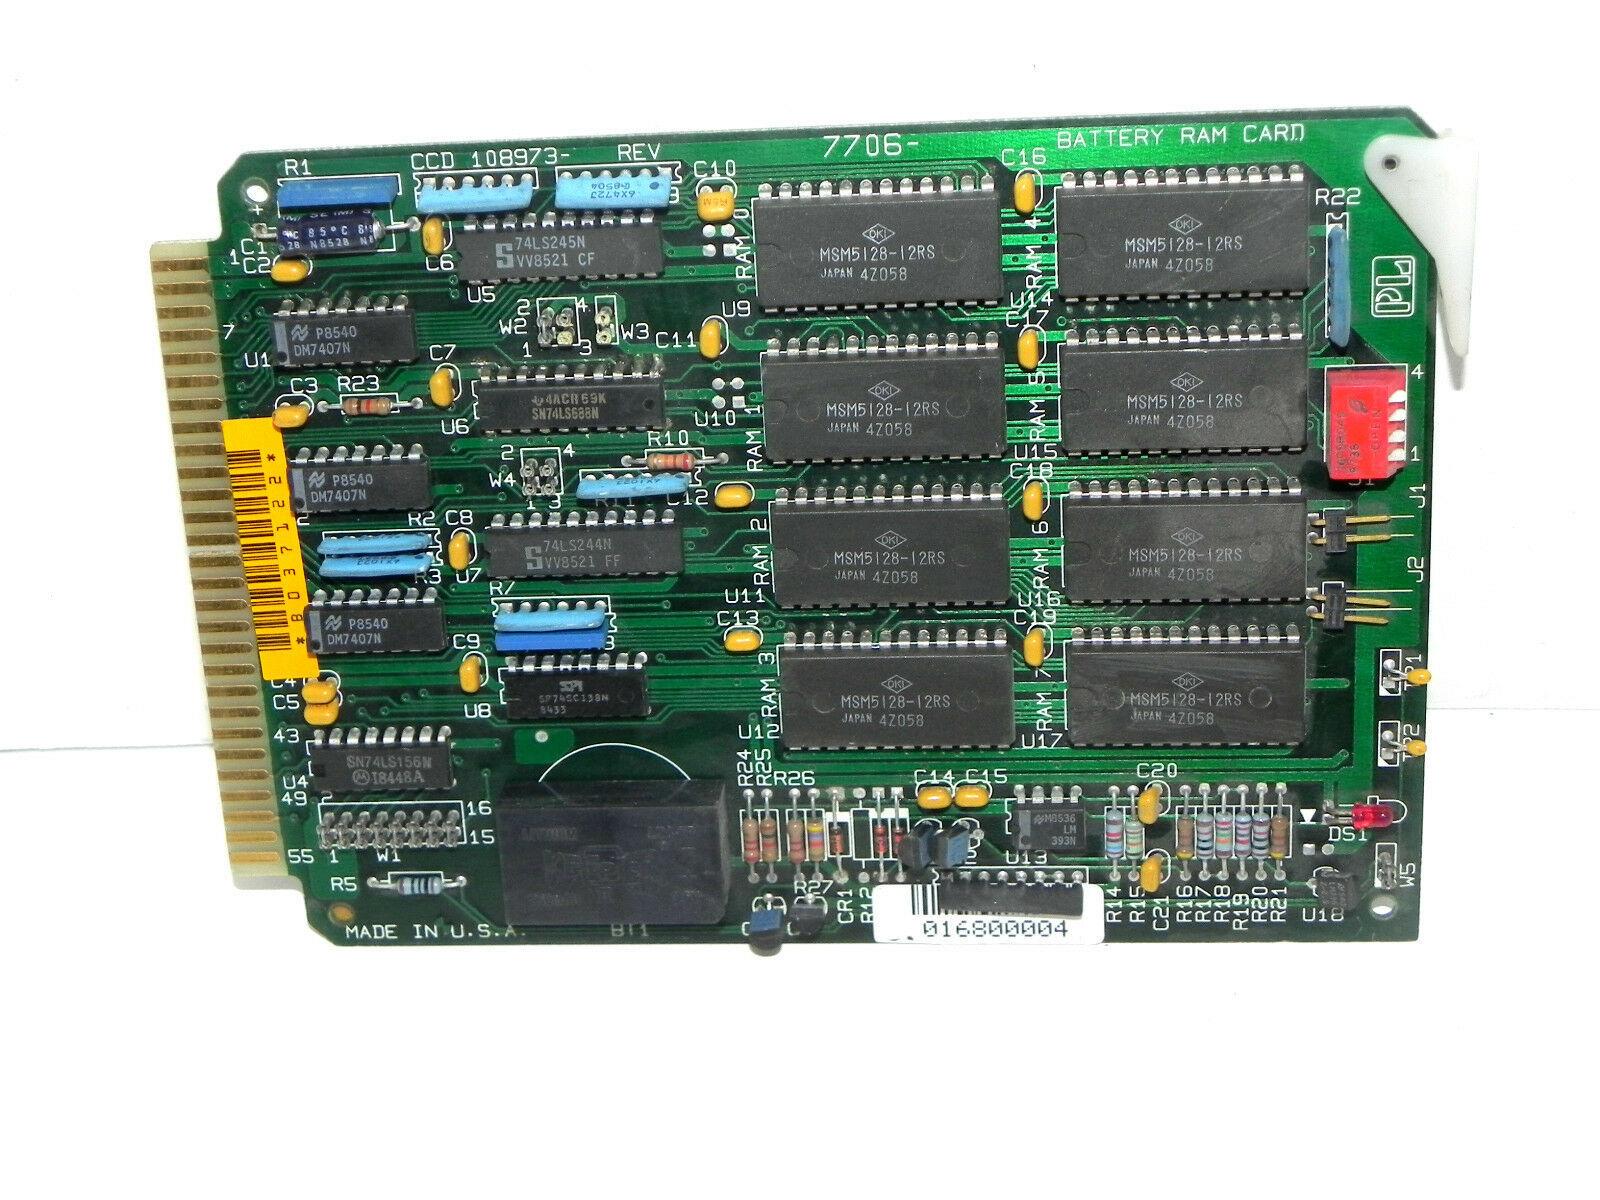 GRECON 108973 BATTERY RAM CARD